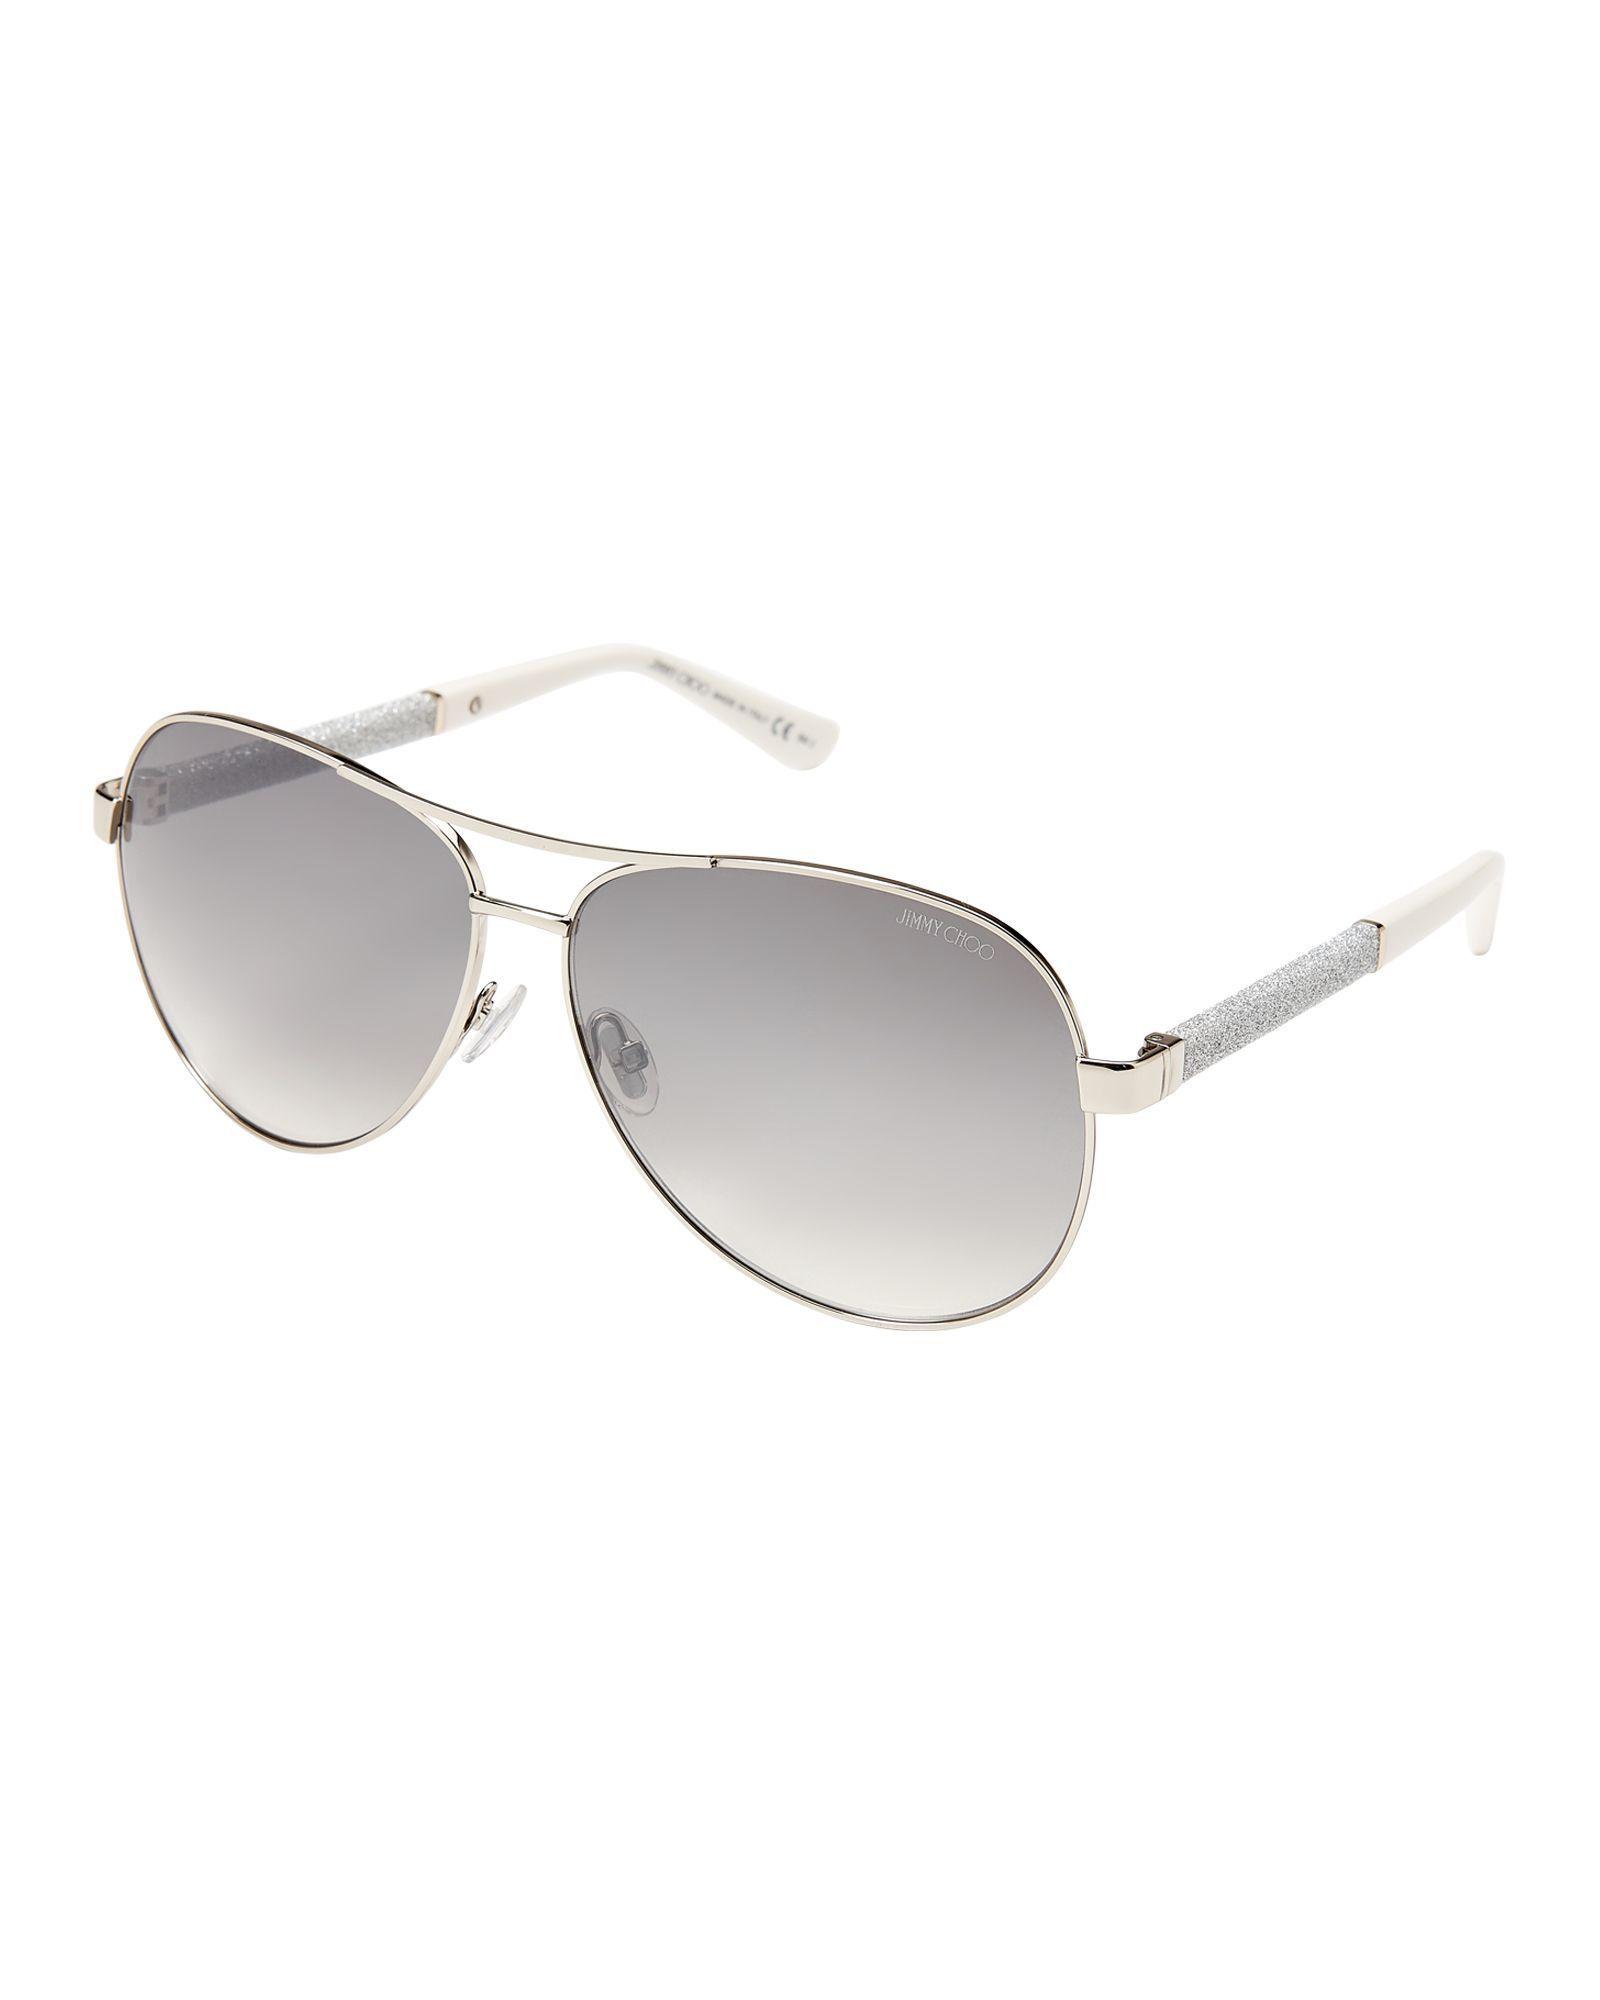 ac67d8d81a8 Jimmy Choo Lexie Silver-Tone Aviator Sunglasses